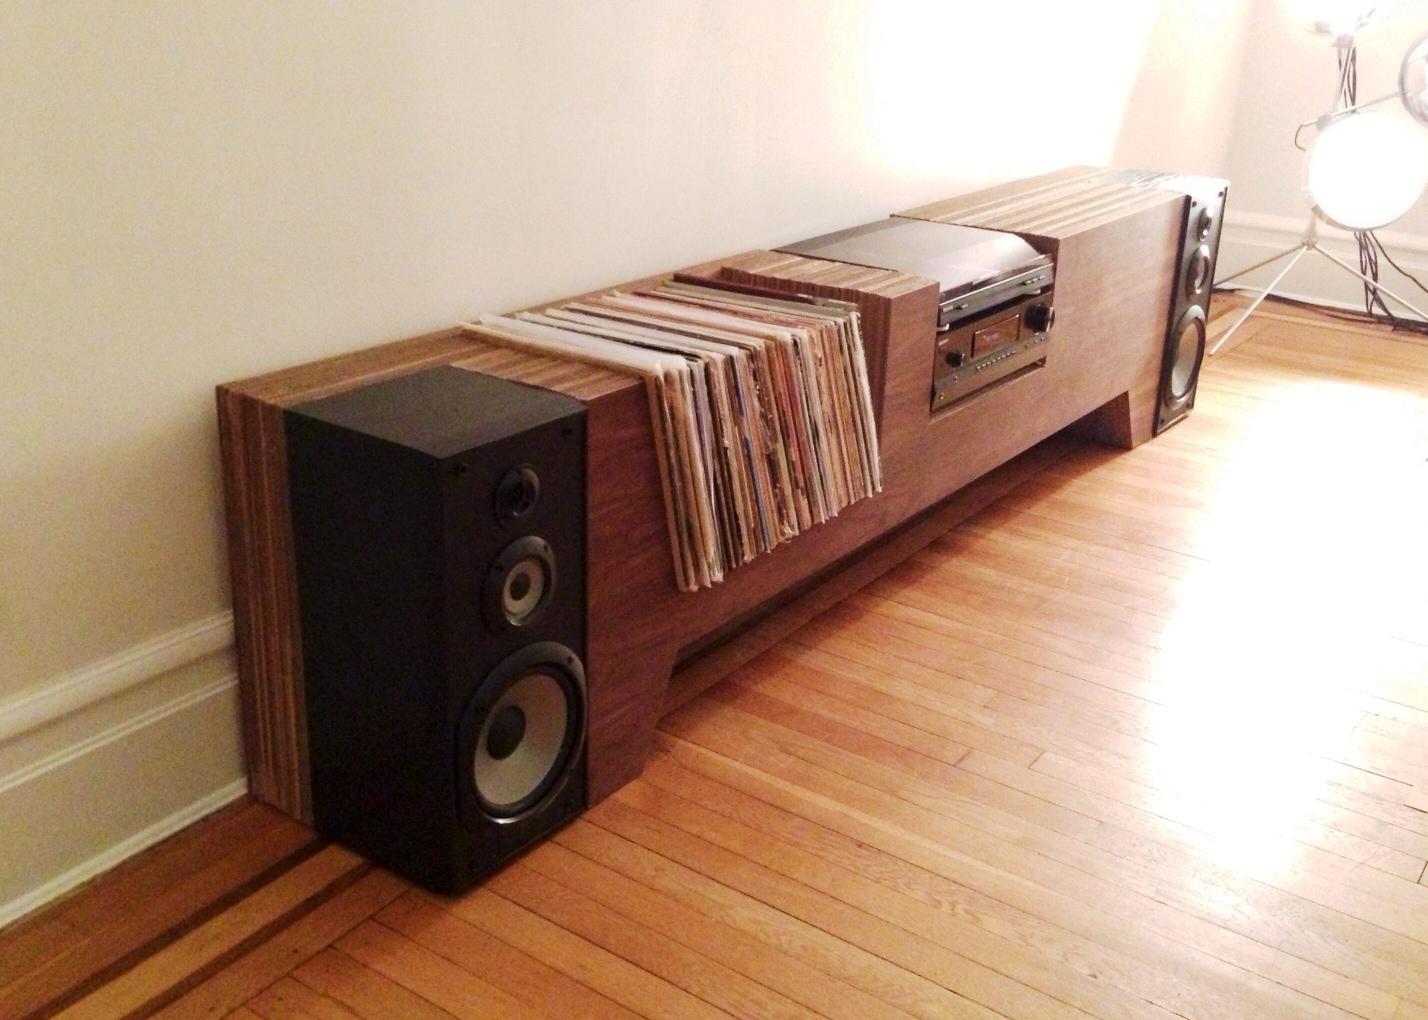 ... Design Studio: [Furniture] Cardboard and Walnut Record Player Console